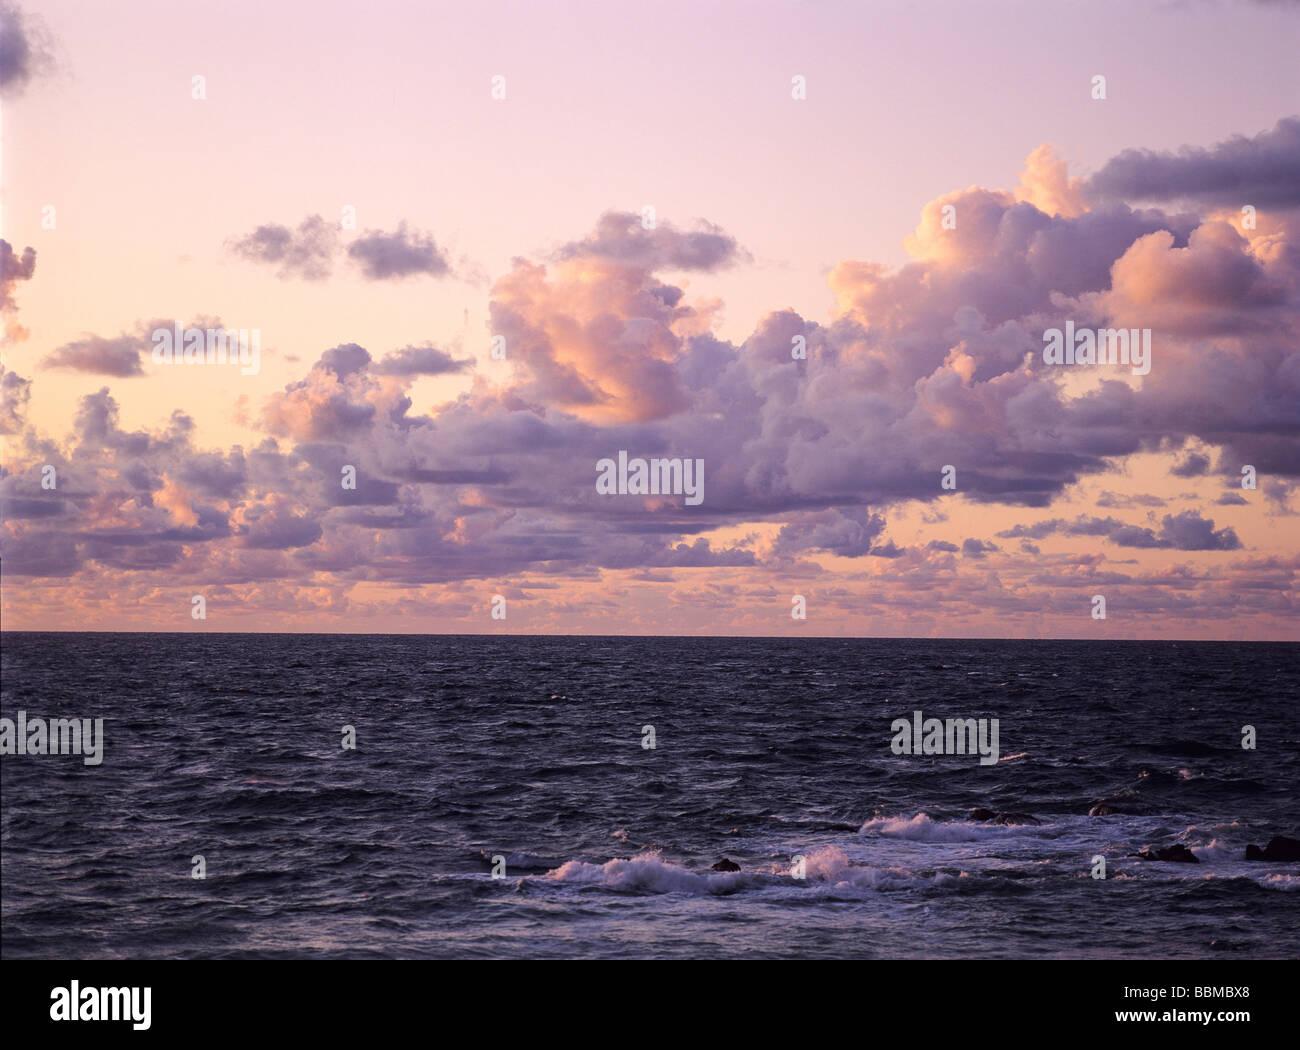 Sonnenuntergang über dem Meer mit Blick auf den Ozean Horizont Stockbild